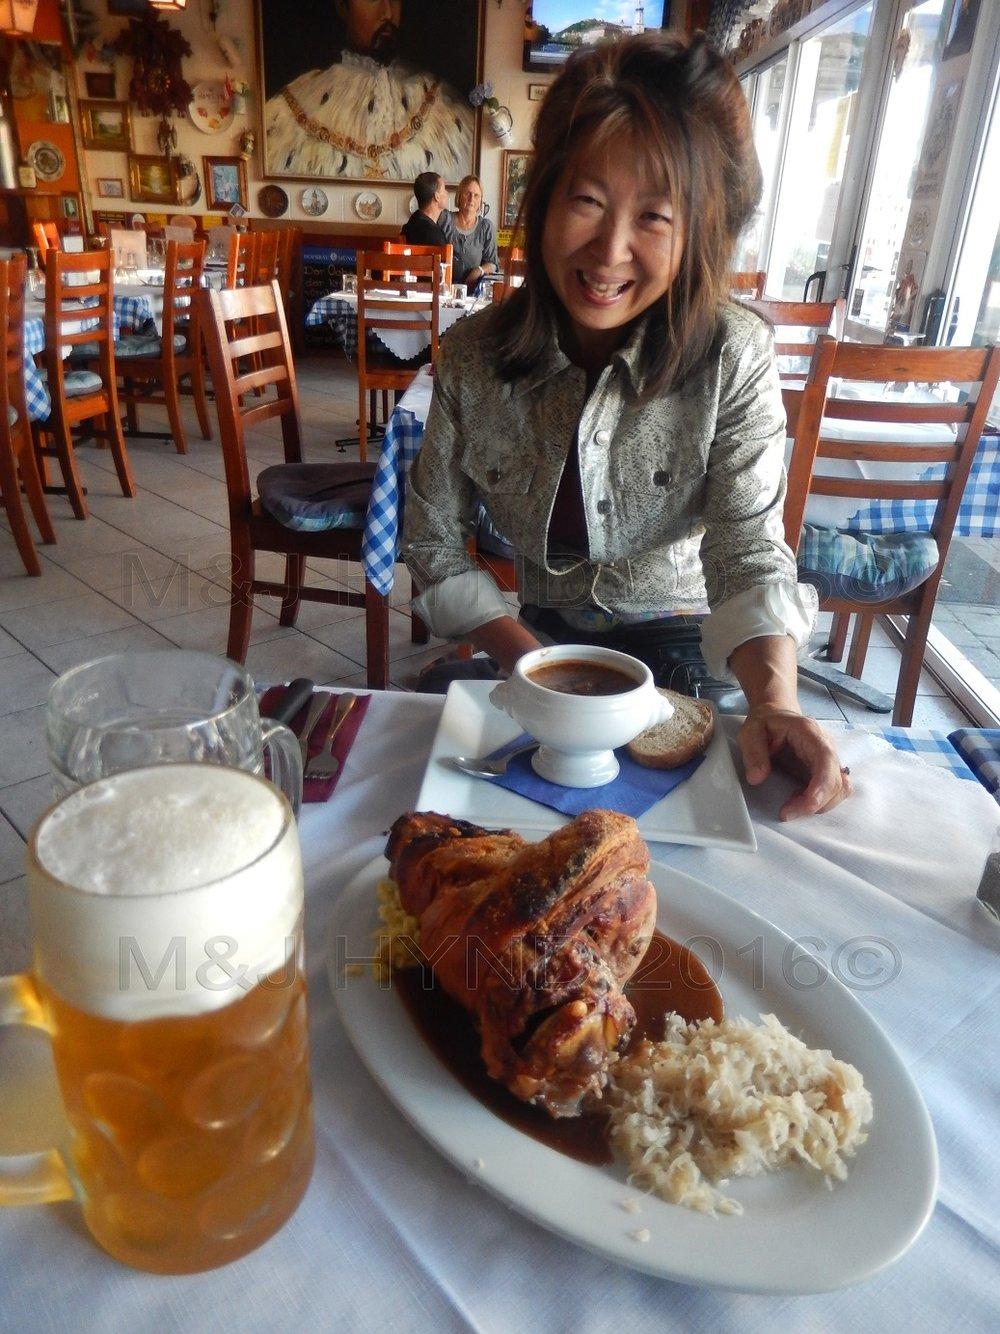 Der Metz restaurant Oktoberfest gulaschuppe beer pork hock, Auckland, NZ